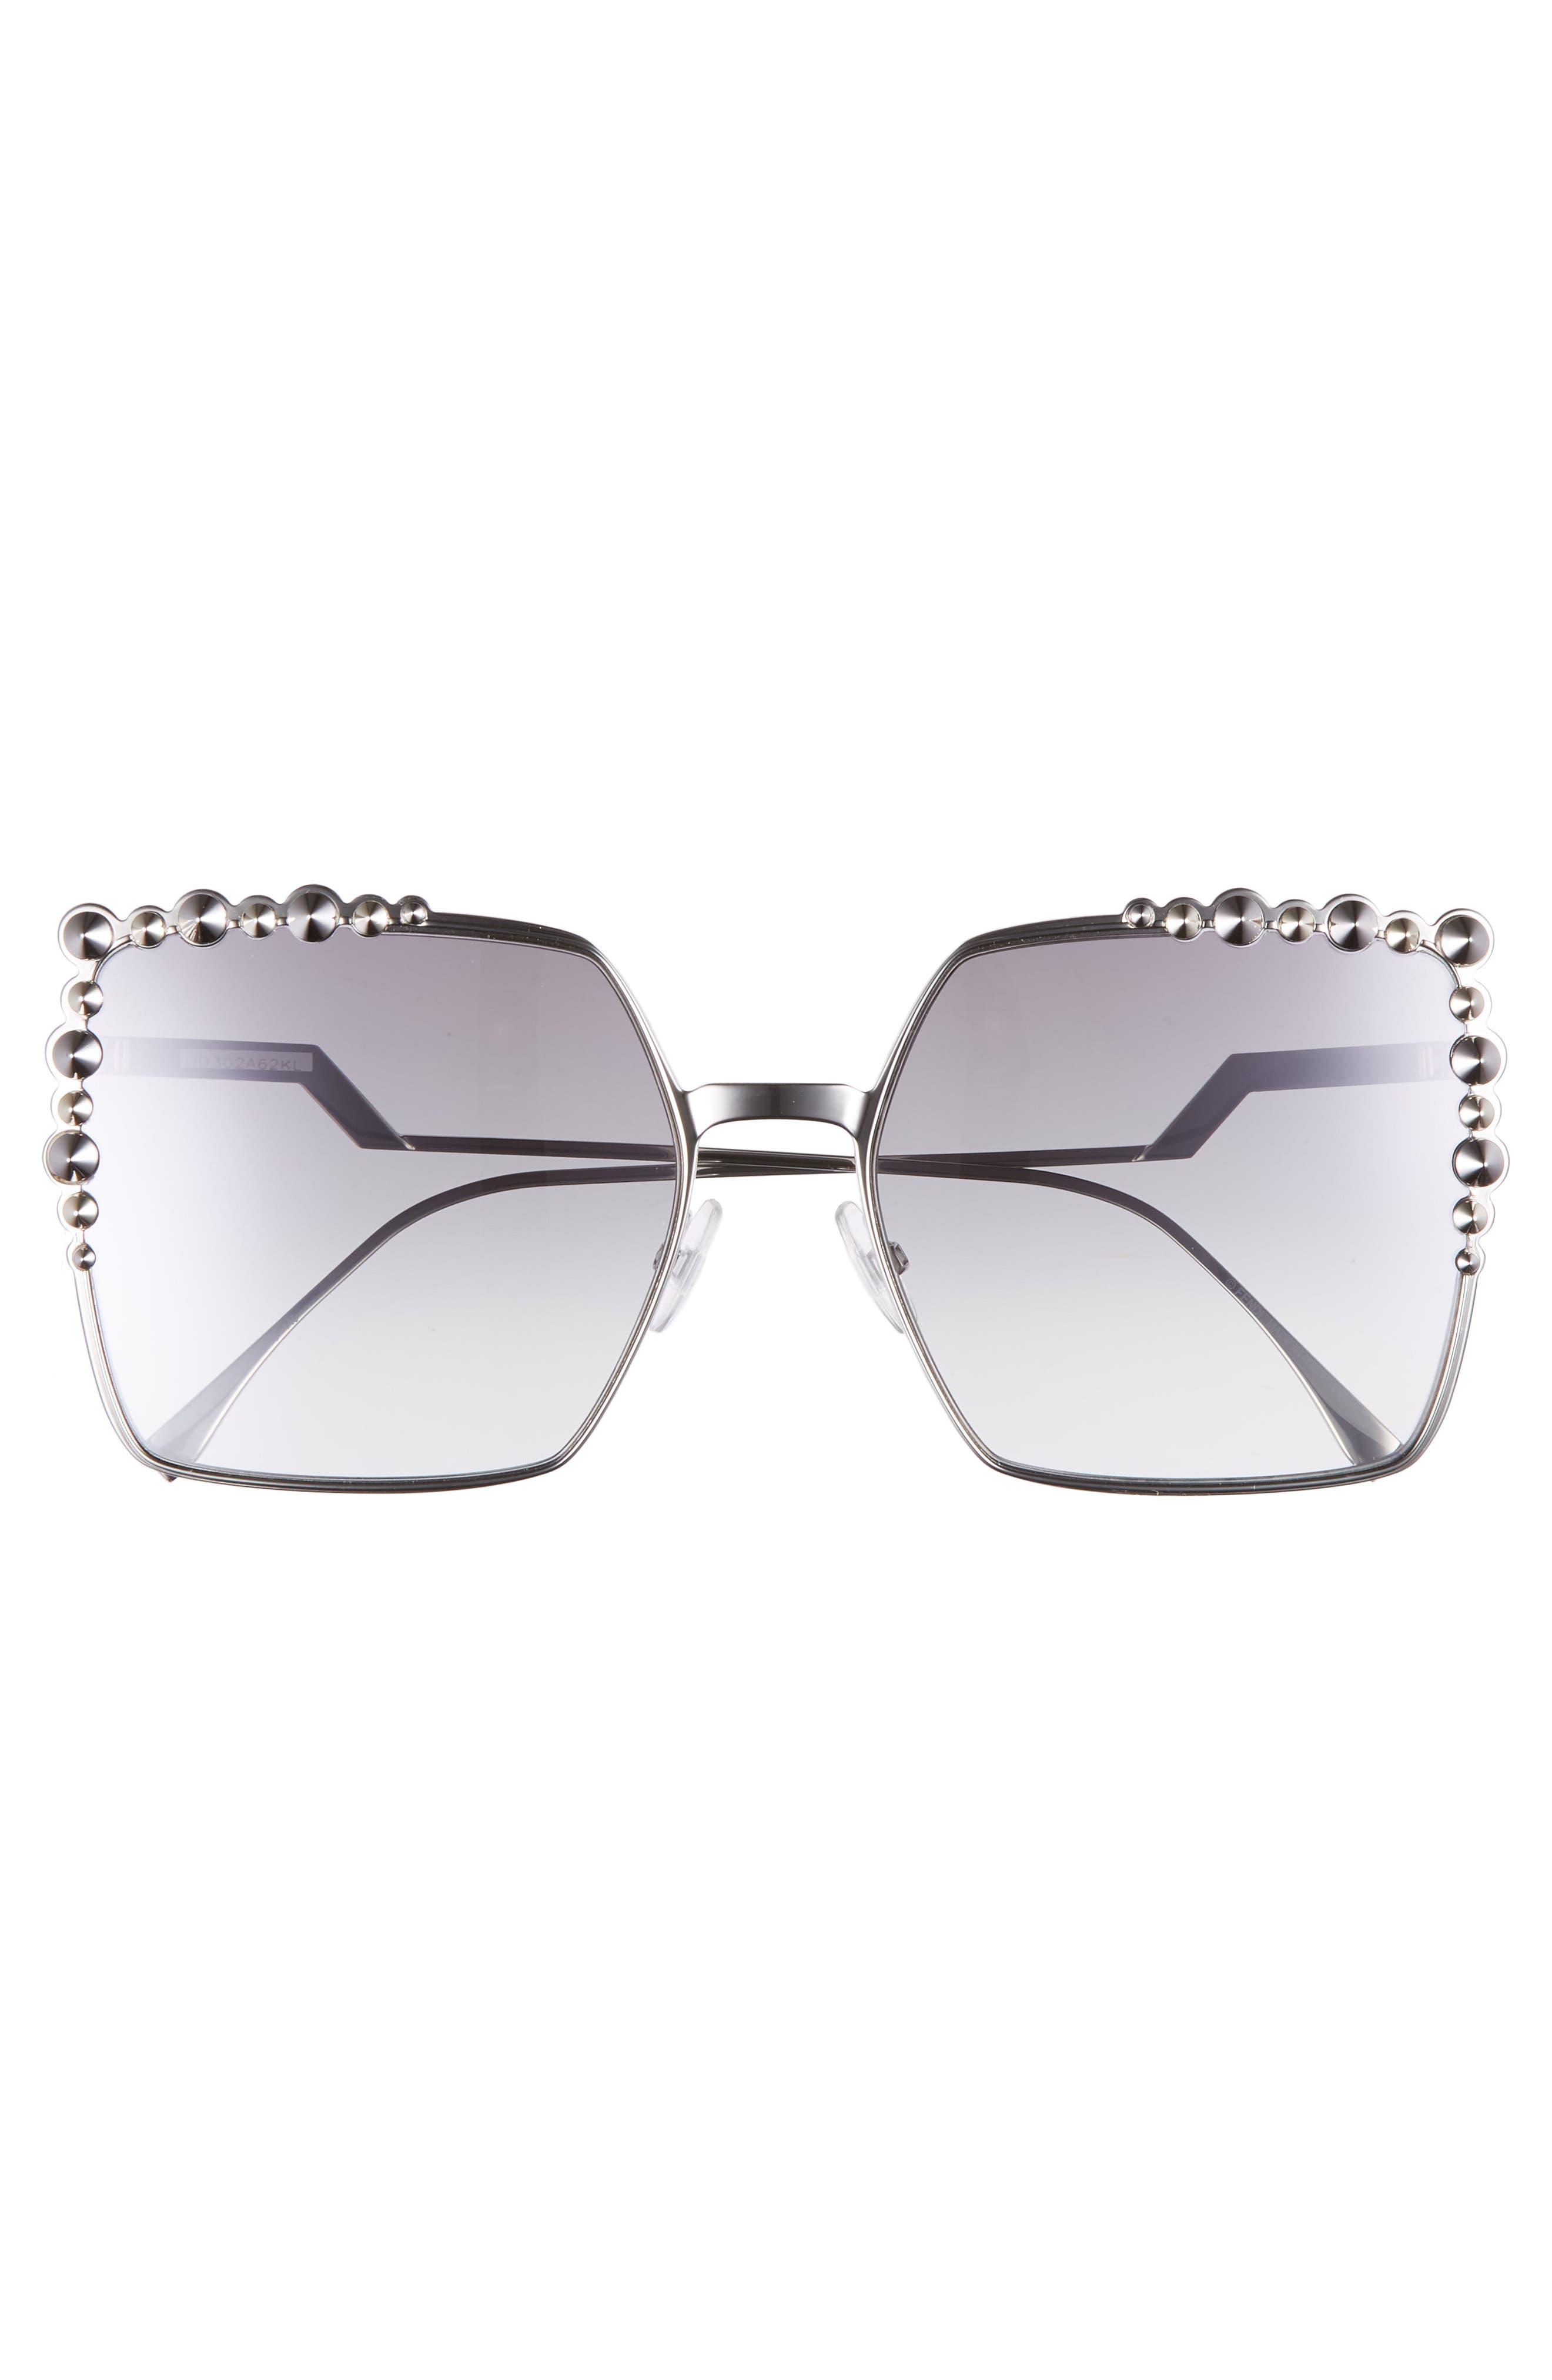 60mm Gradient Square Cat Eye Sunglasses,                             Alternate thumbnail 3, color,                             043